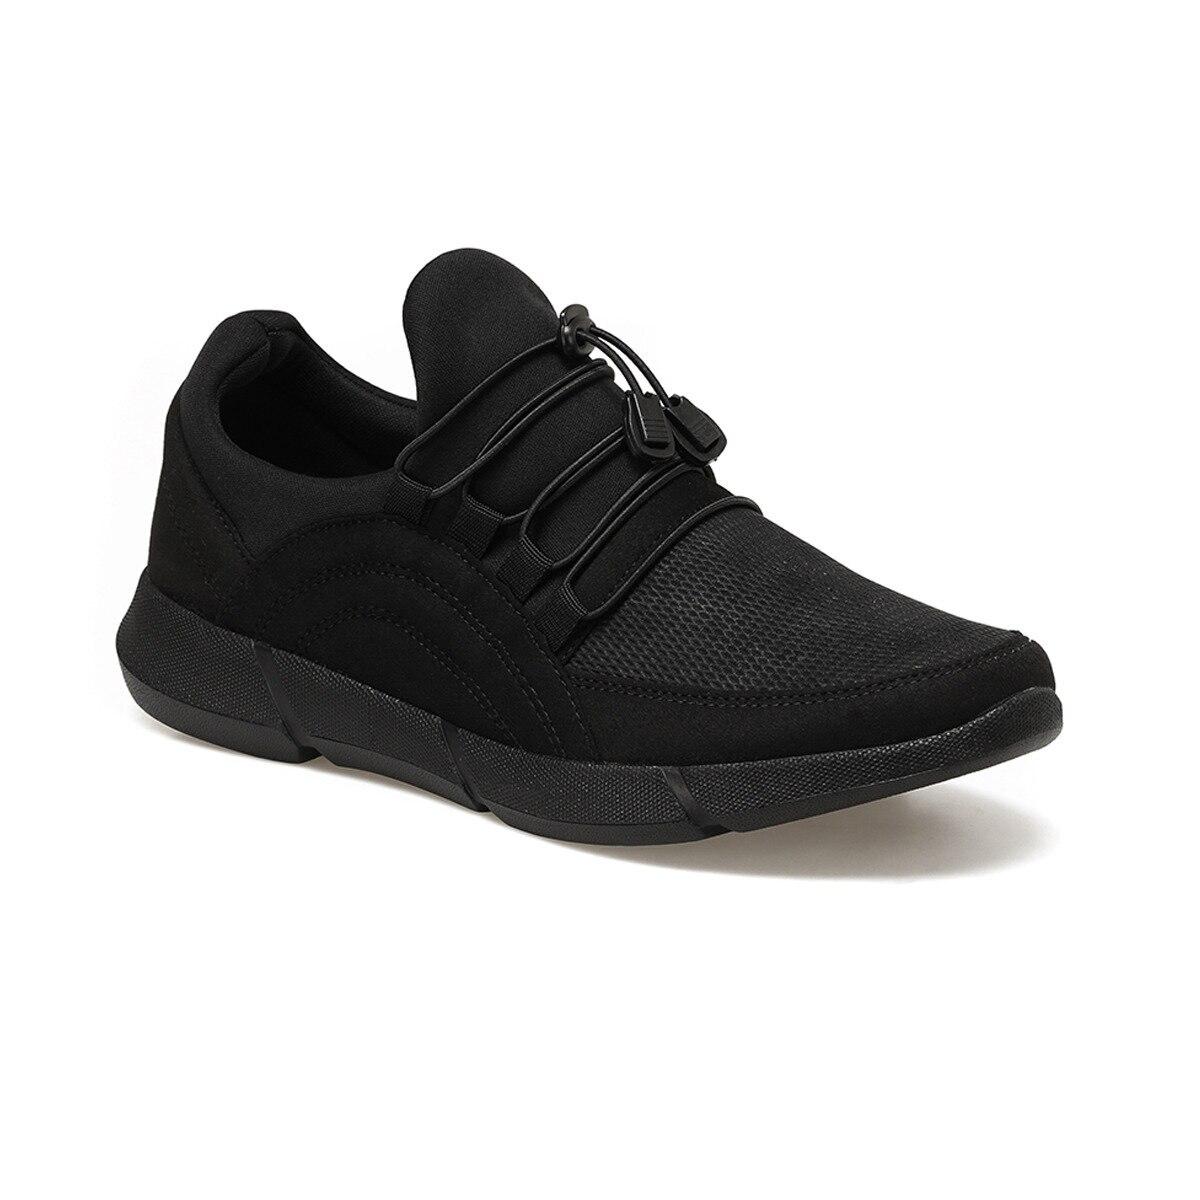 FLO AYD-1 Siyah Erkek Ayakkabı Forester